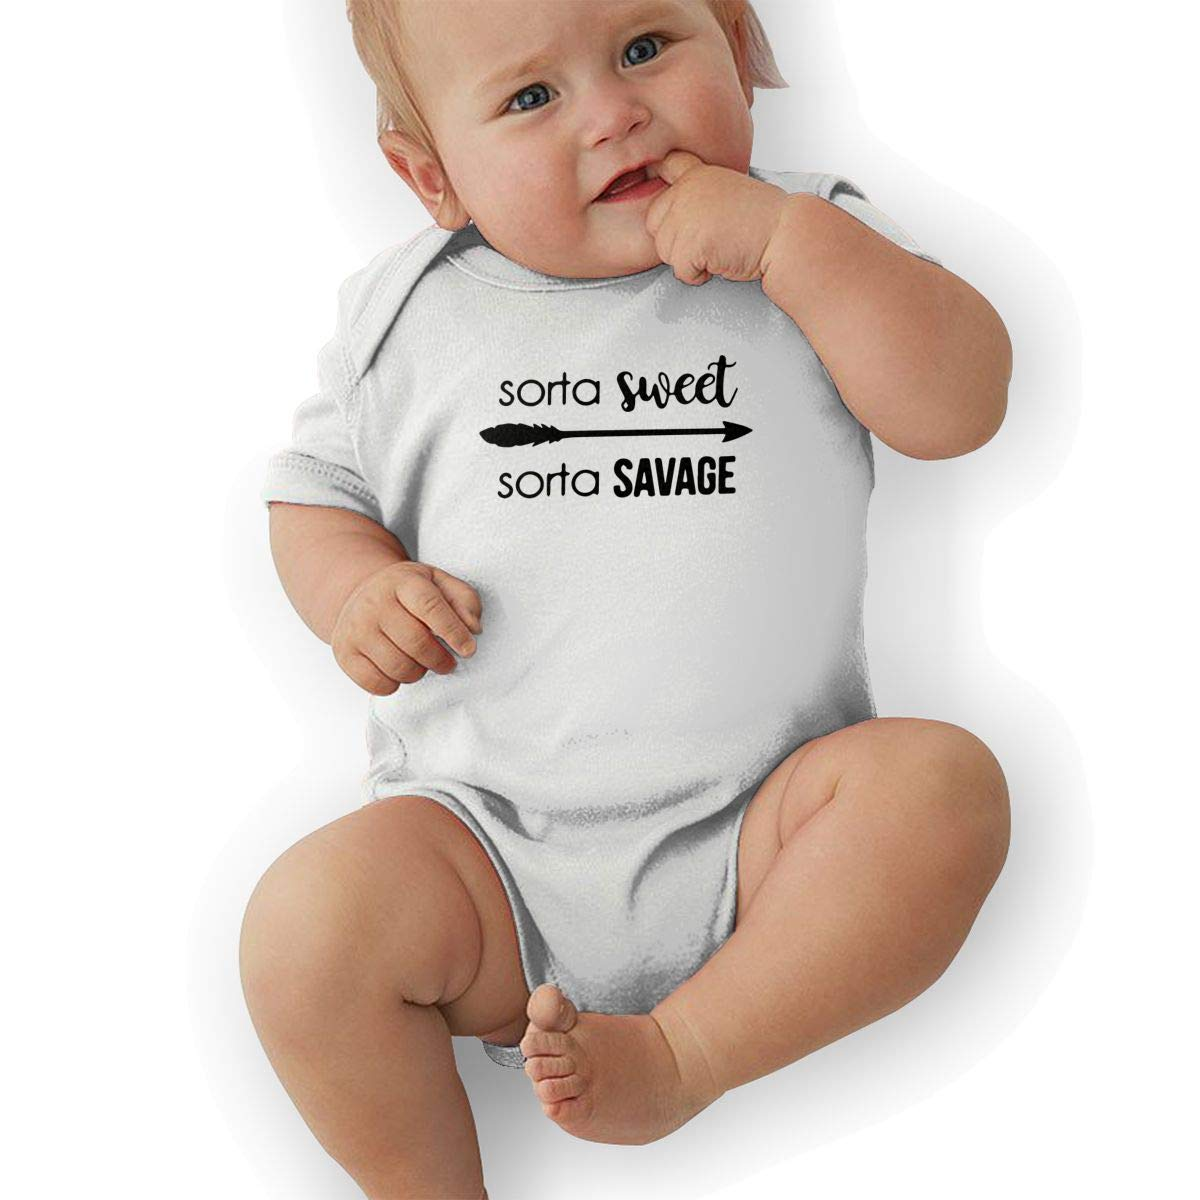 U88oi-8 Short Sleeve Cotton Rompers for Baby Boys and Girls Cute Sorta Sweet Sorta Savage-1 Crawler